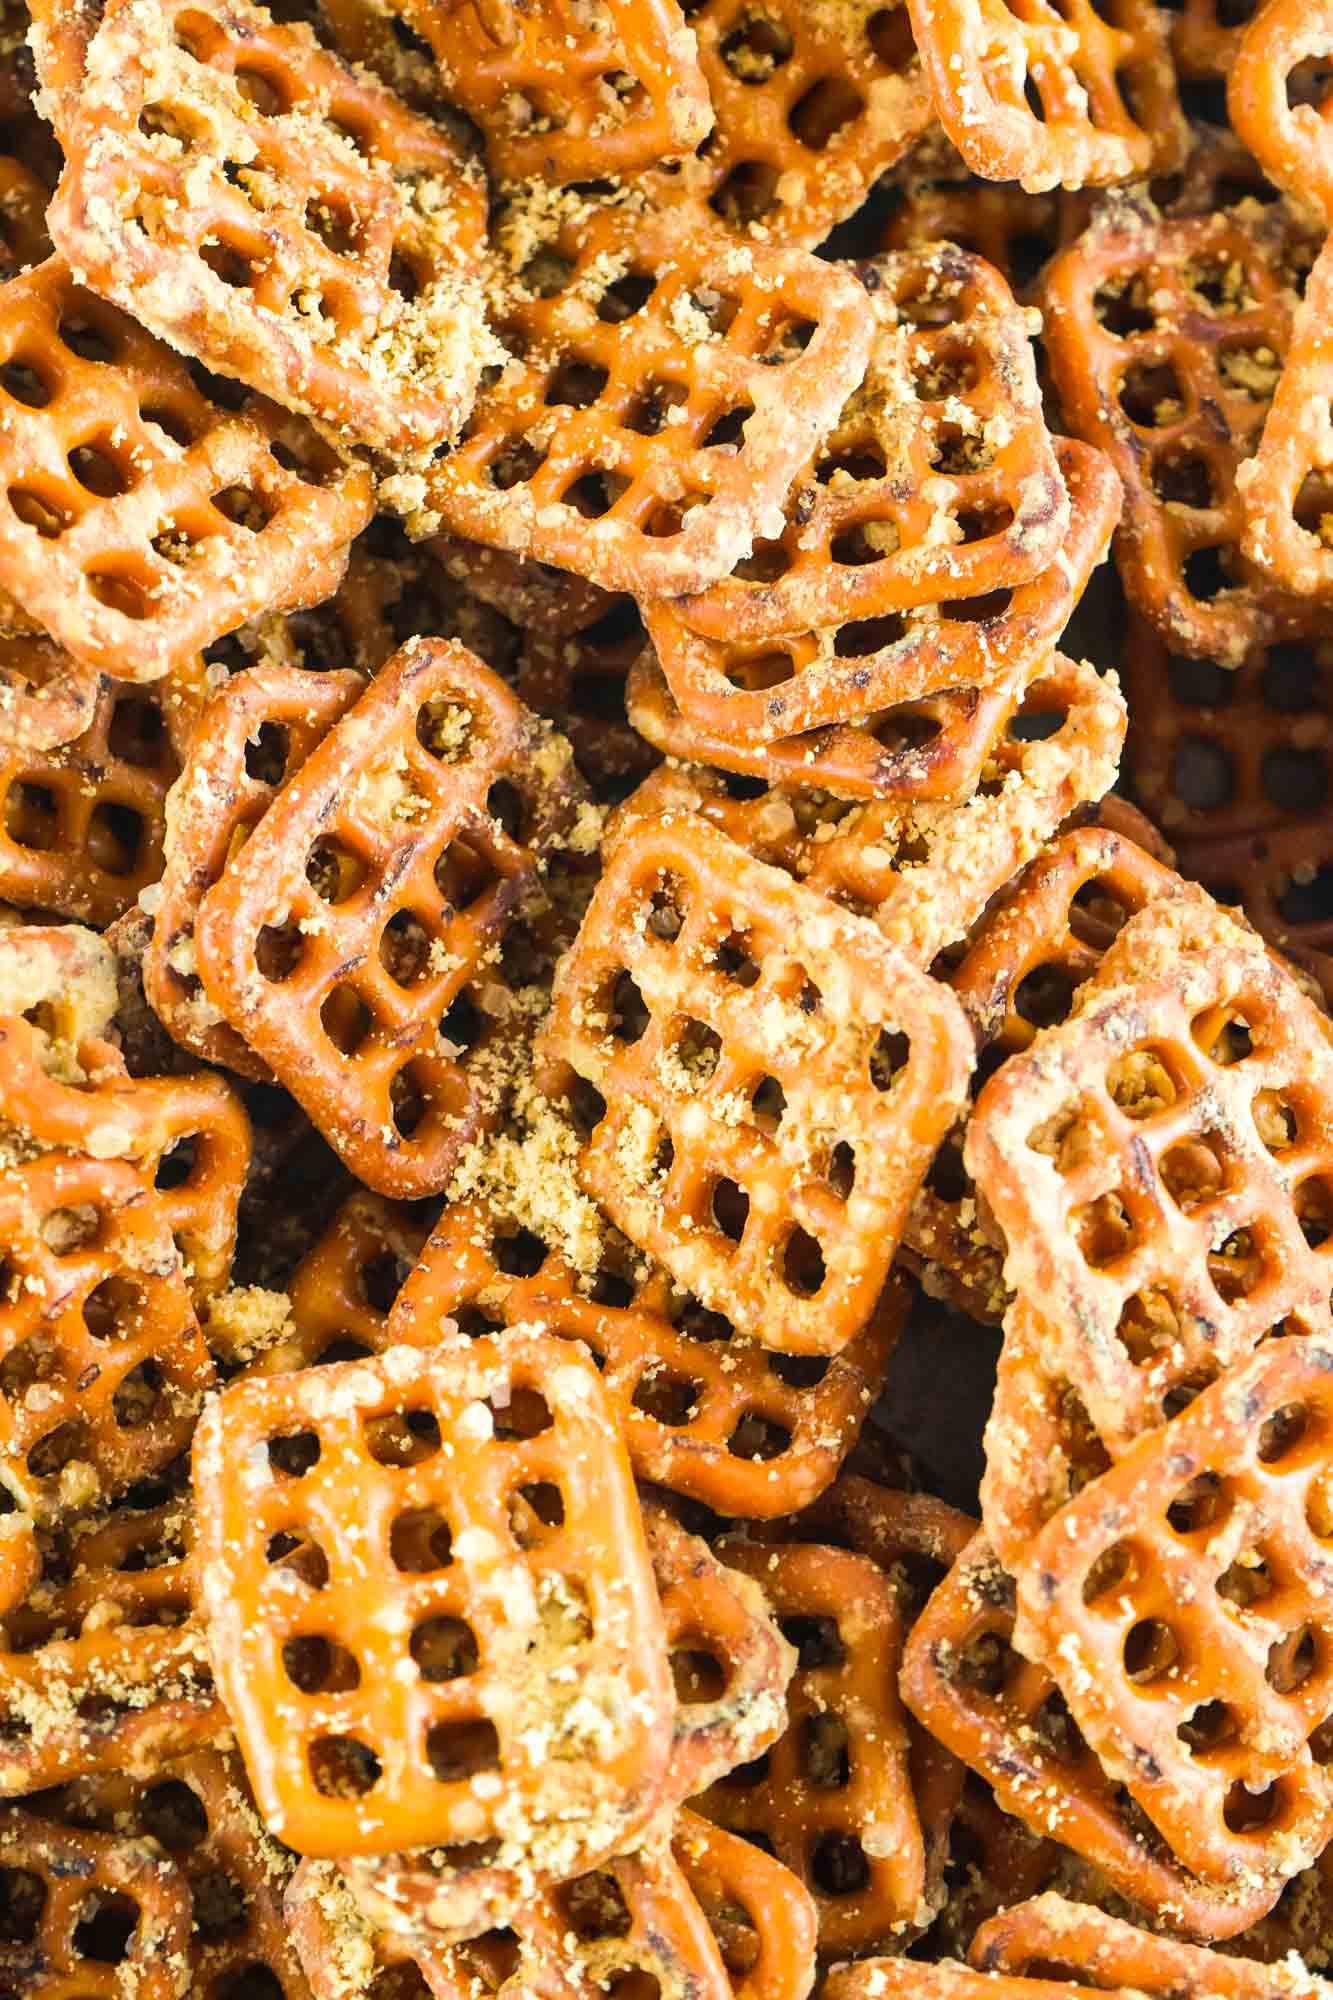 Close up shot of honey mustard pretzels